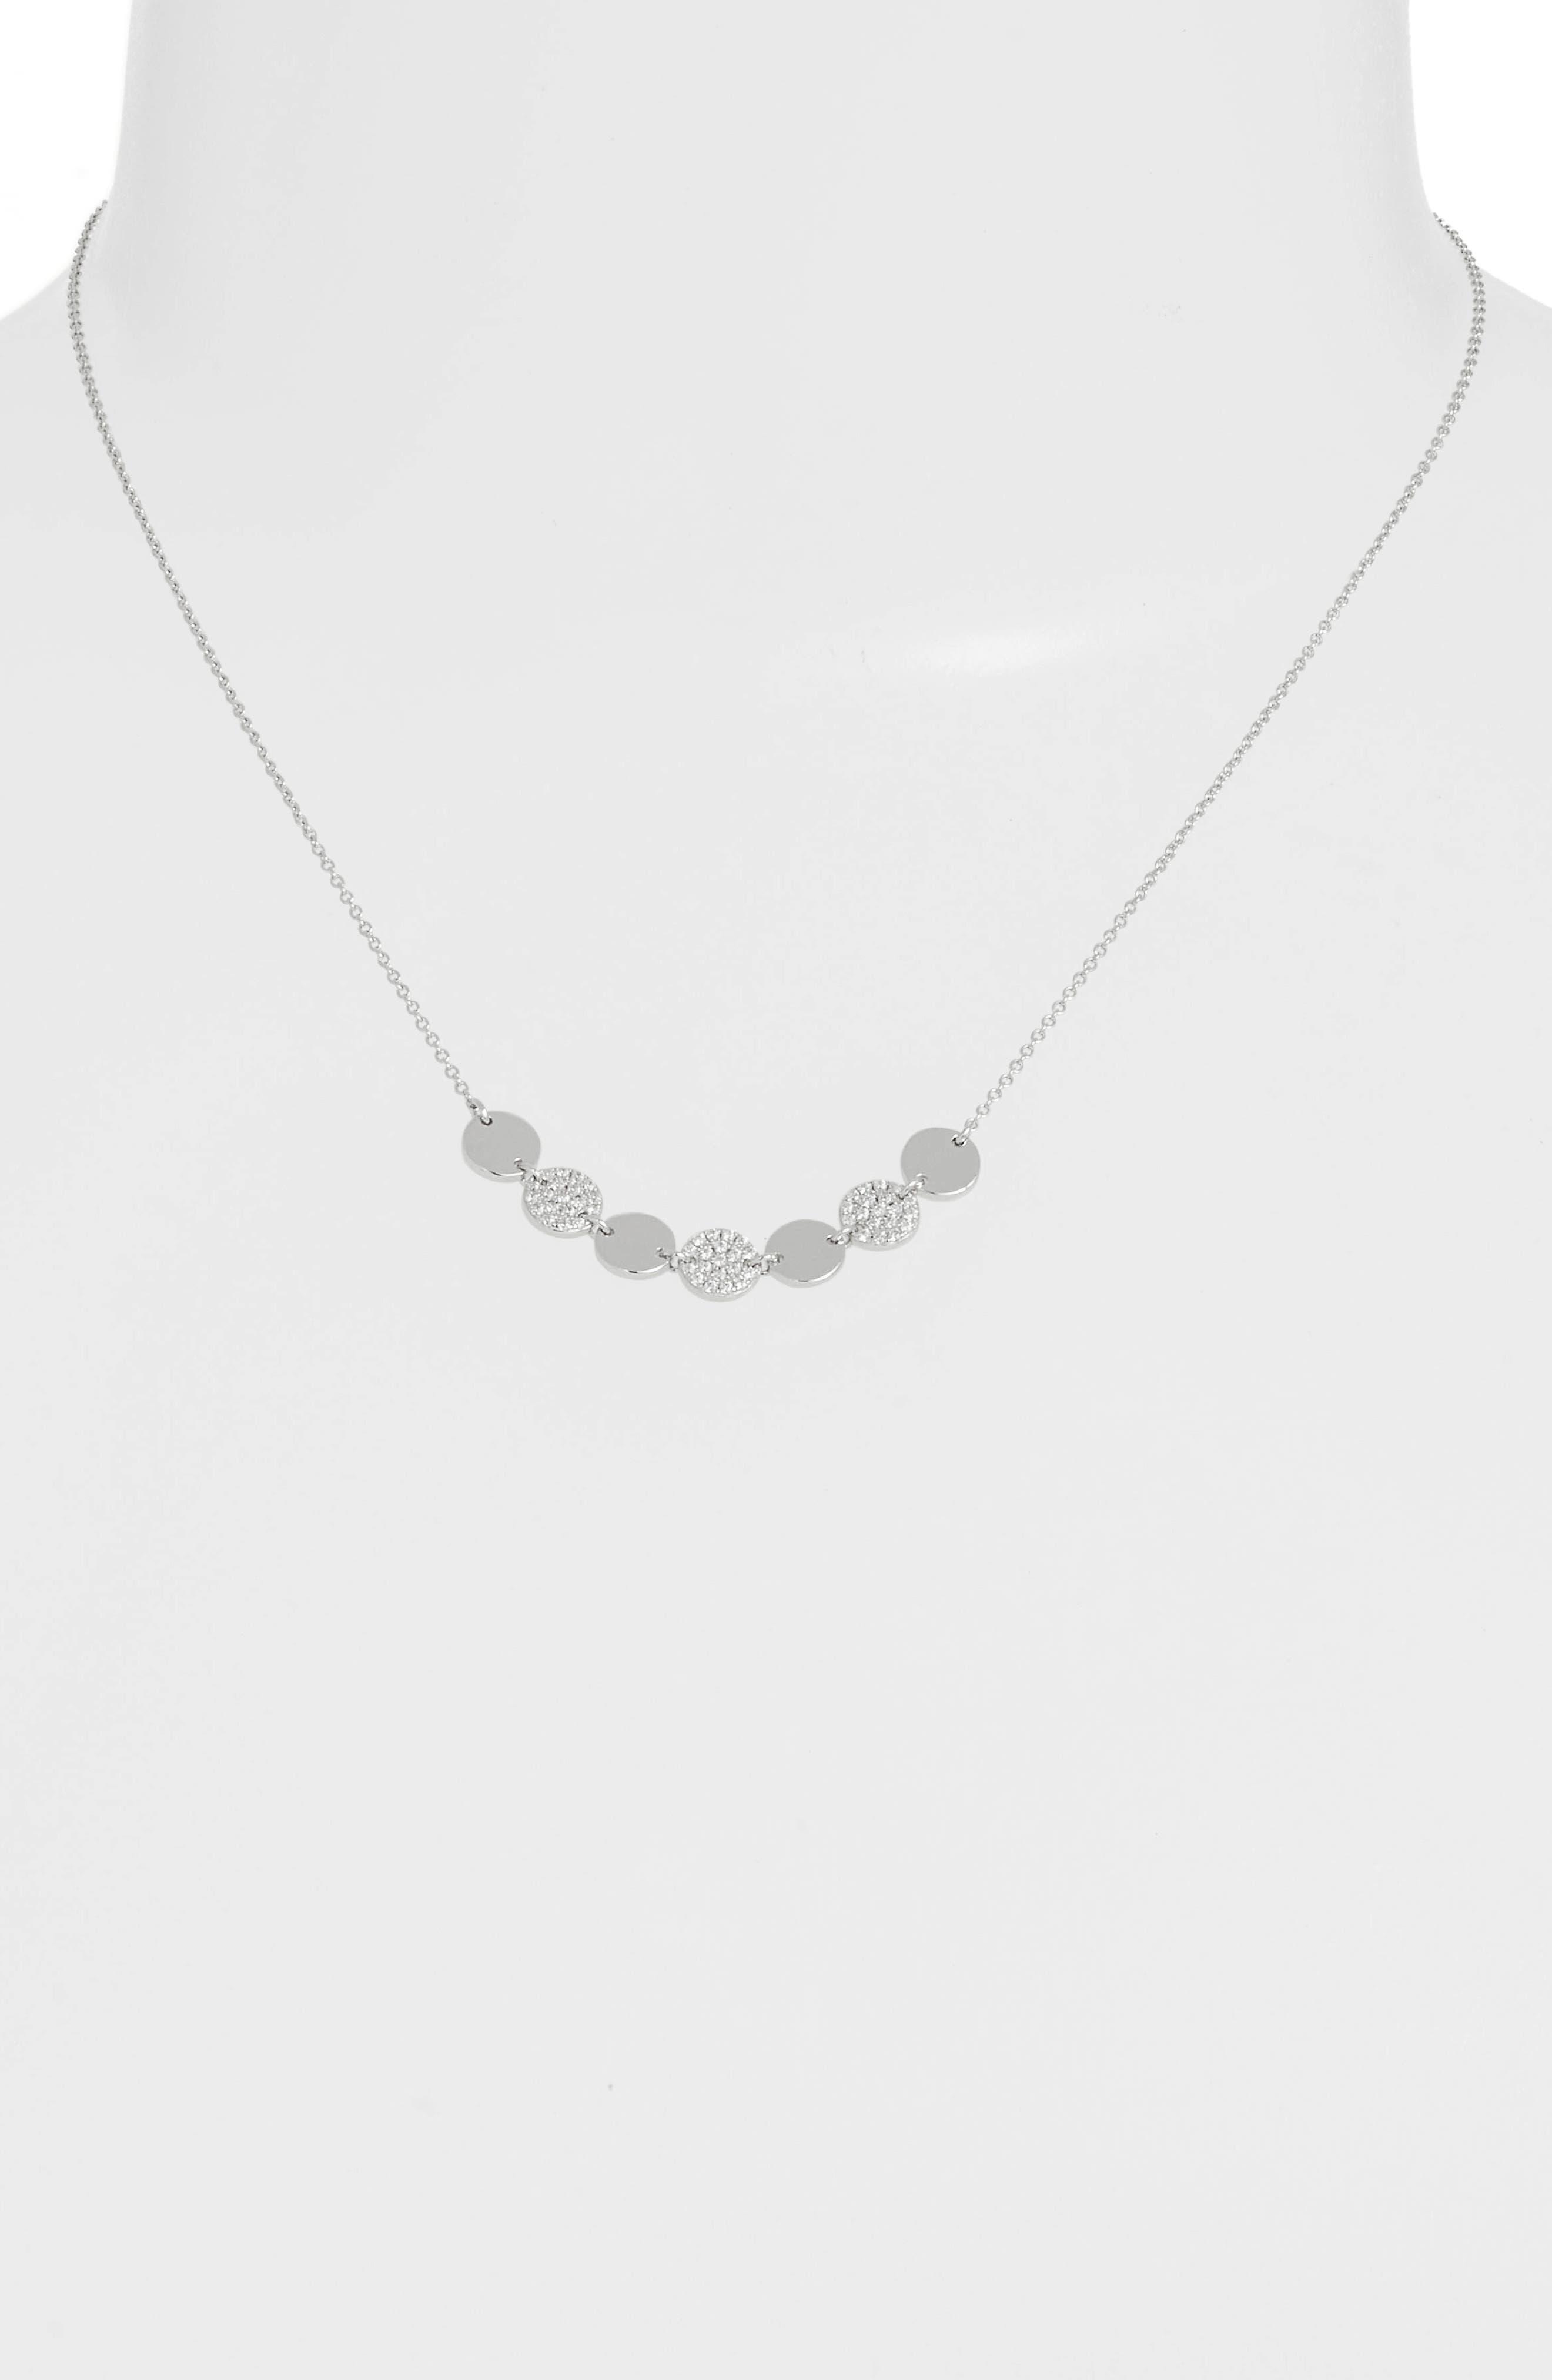 7 Symbols of Joy Choker Necklace,                             Alternate thumbnail 2, color,                             040